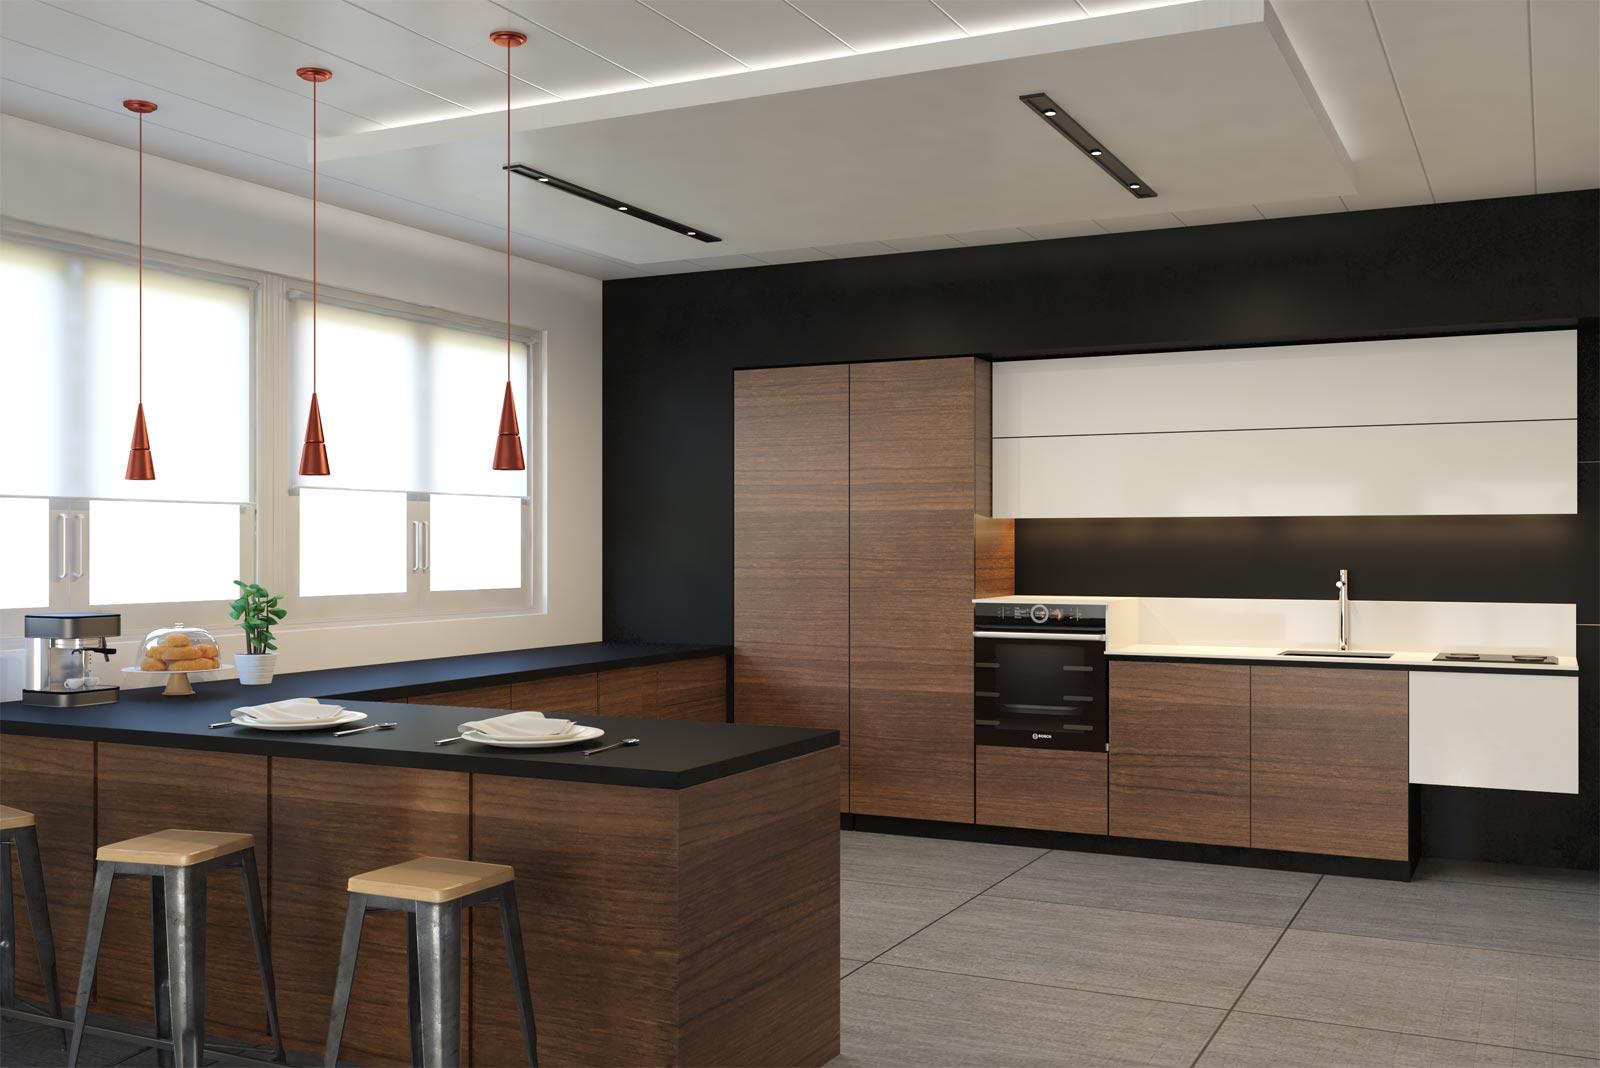 Cucine moderne con rivestimenti personalizzati replace - Rivestimenti cucina moderna ...